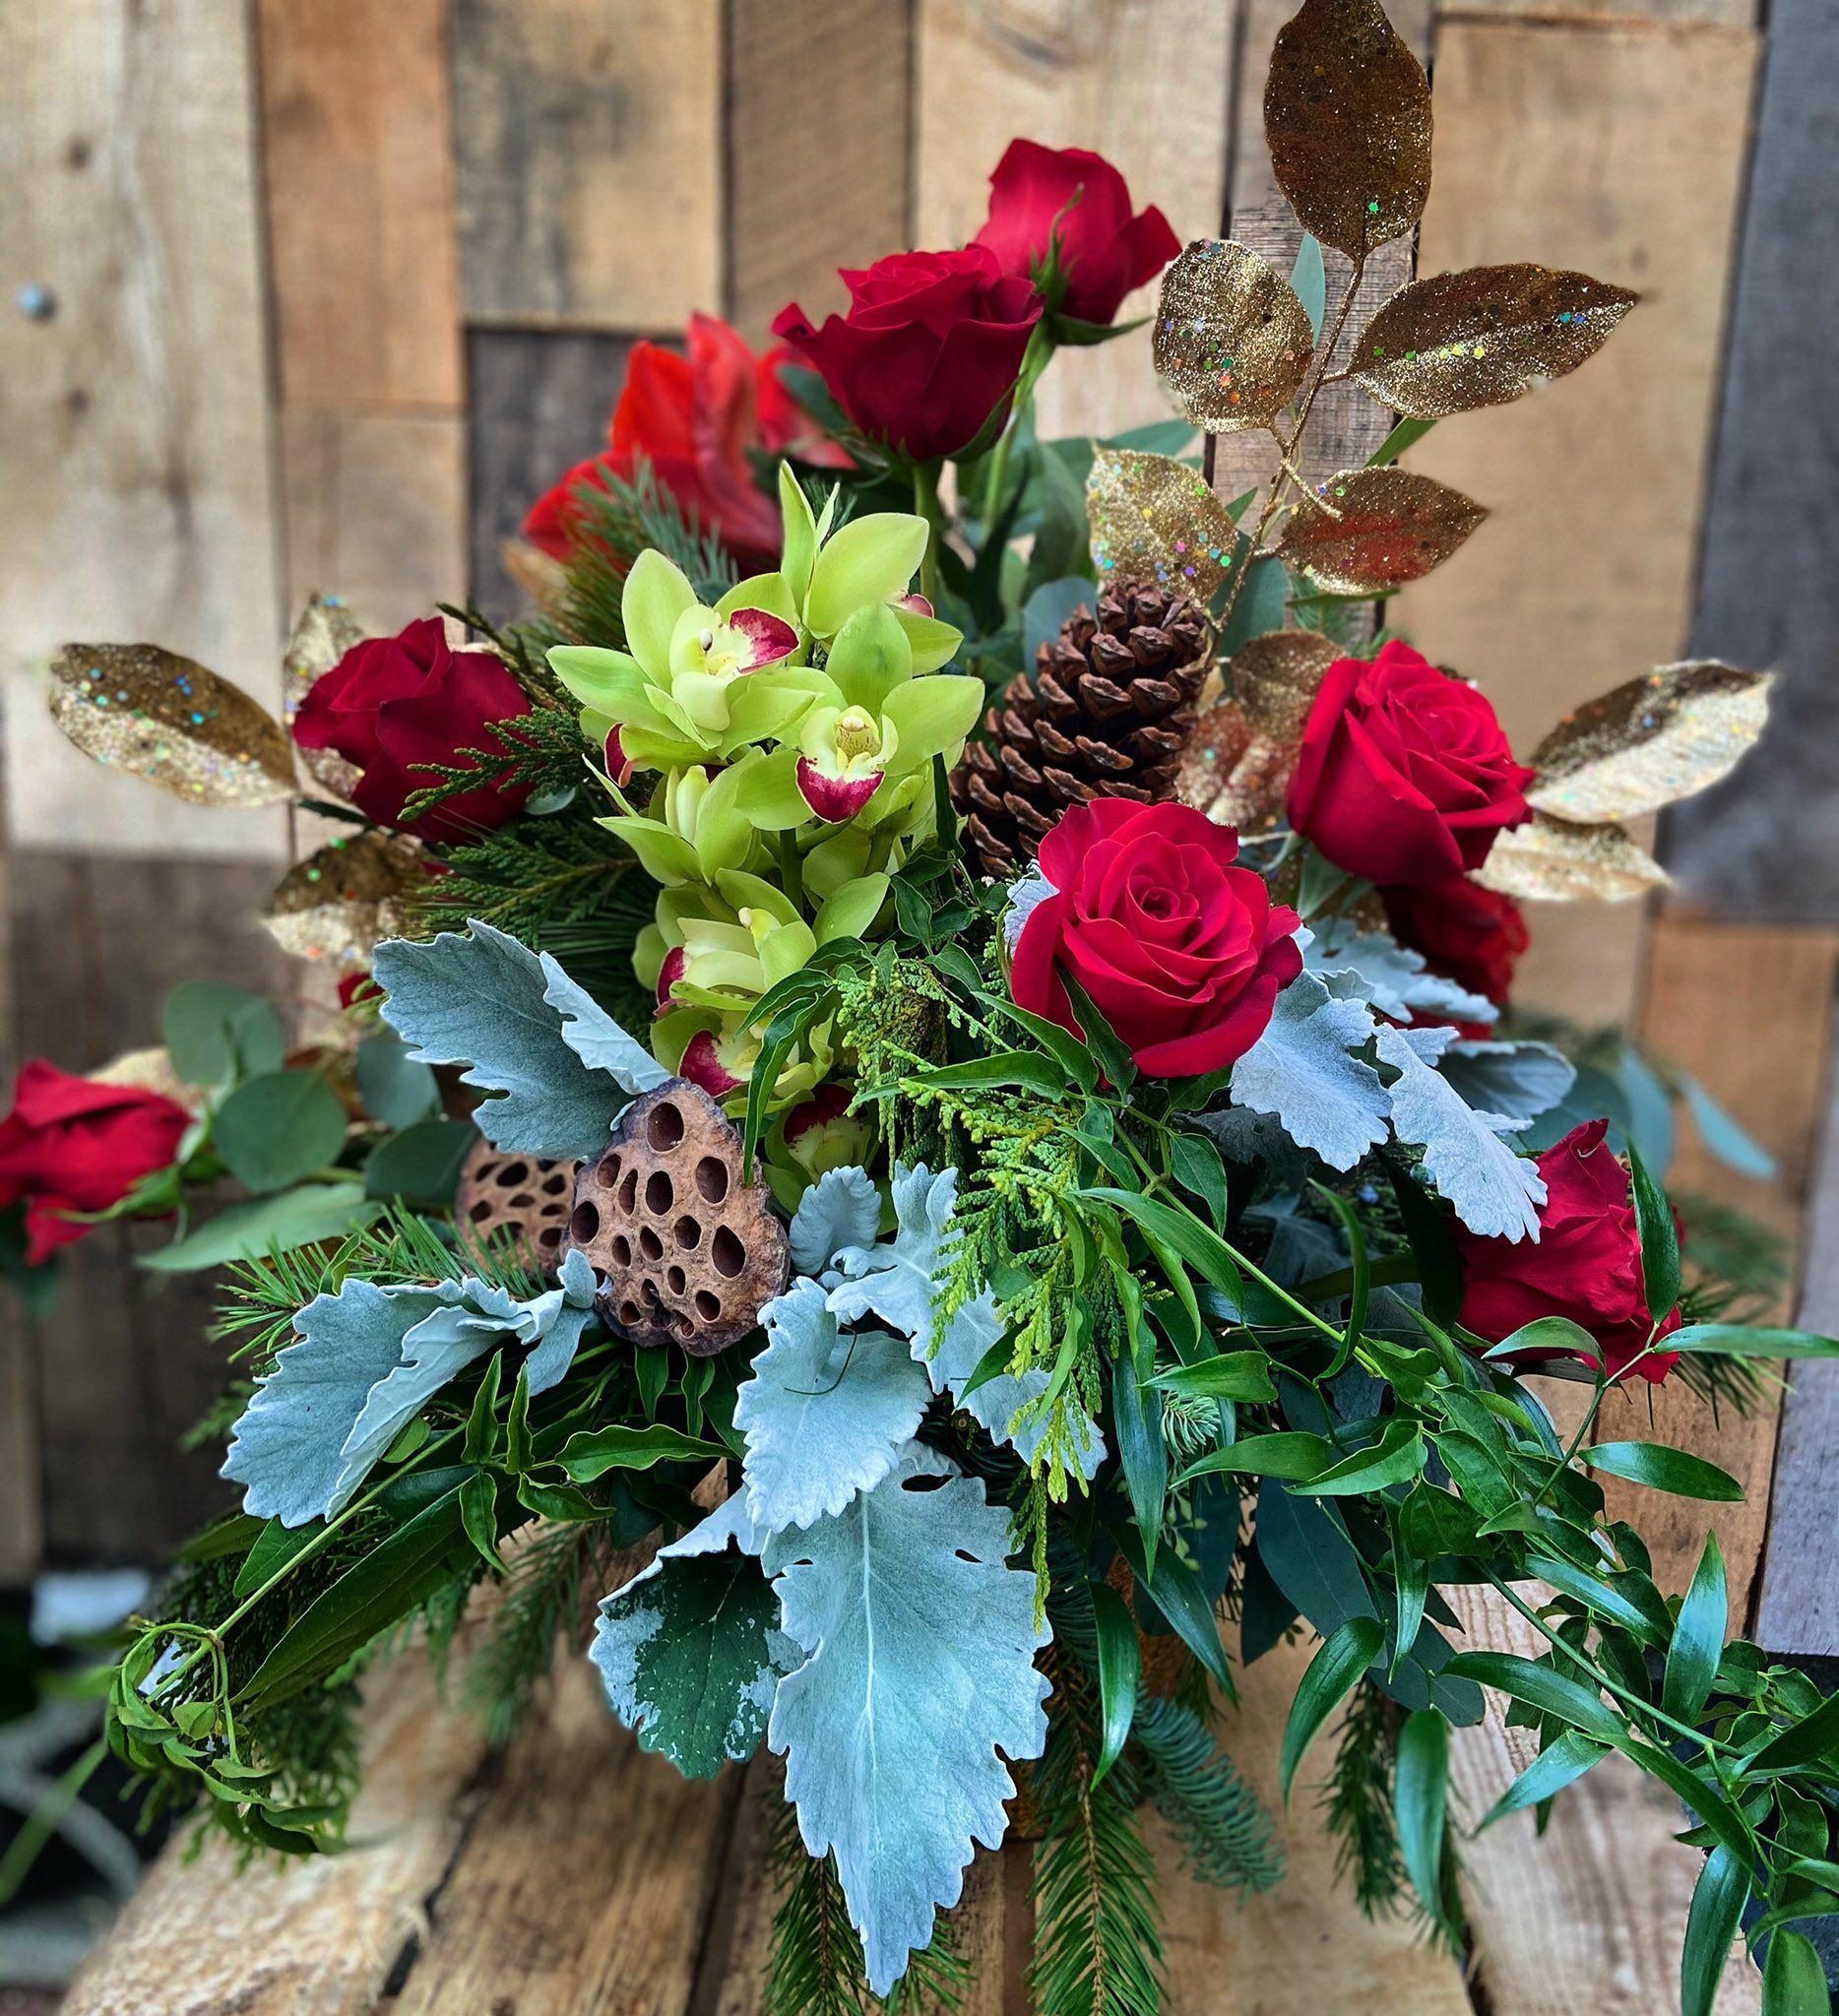 Pin by Kremp Florist on 'Tis the Season! Christmas